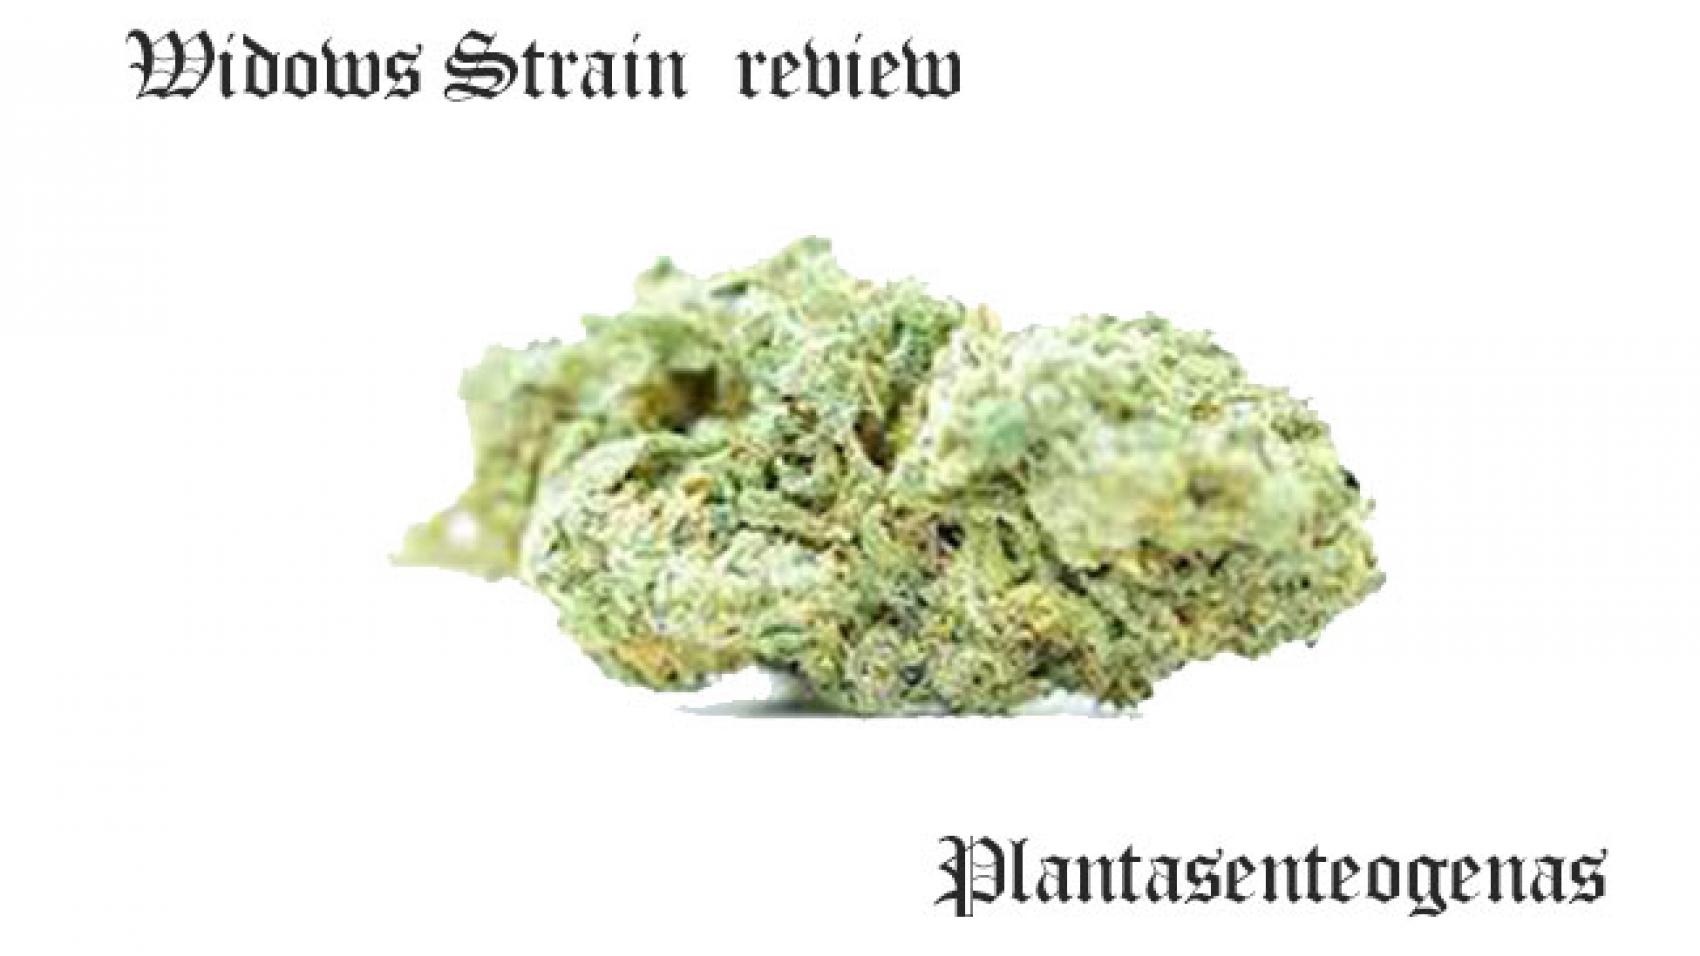 Widows Strain review